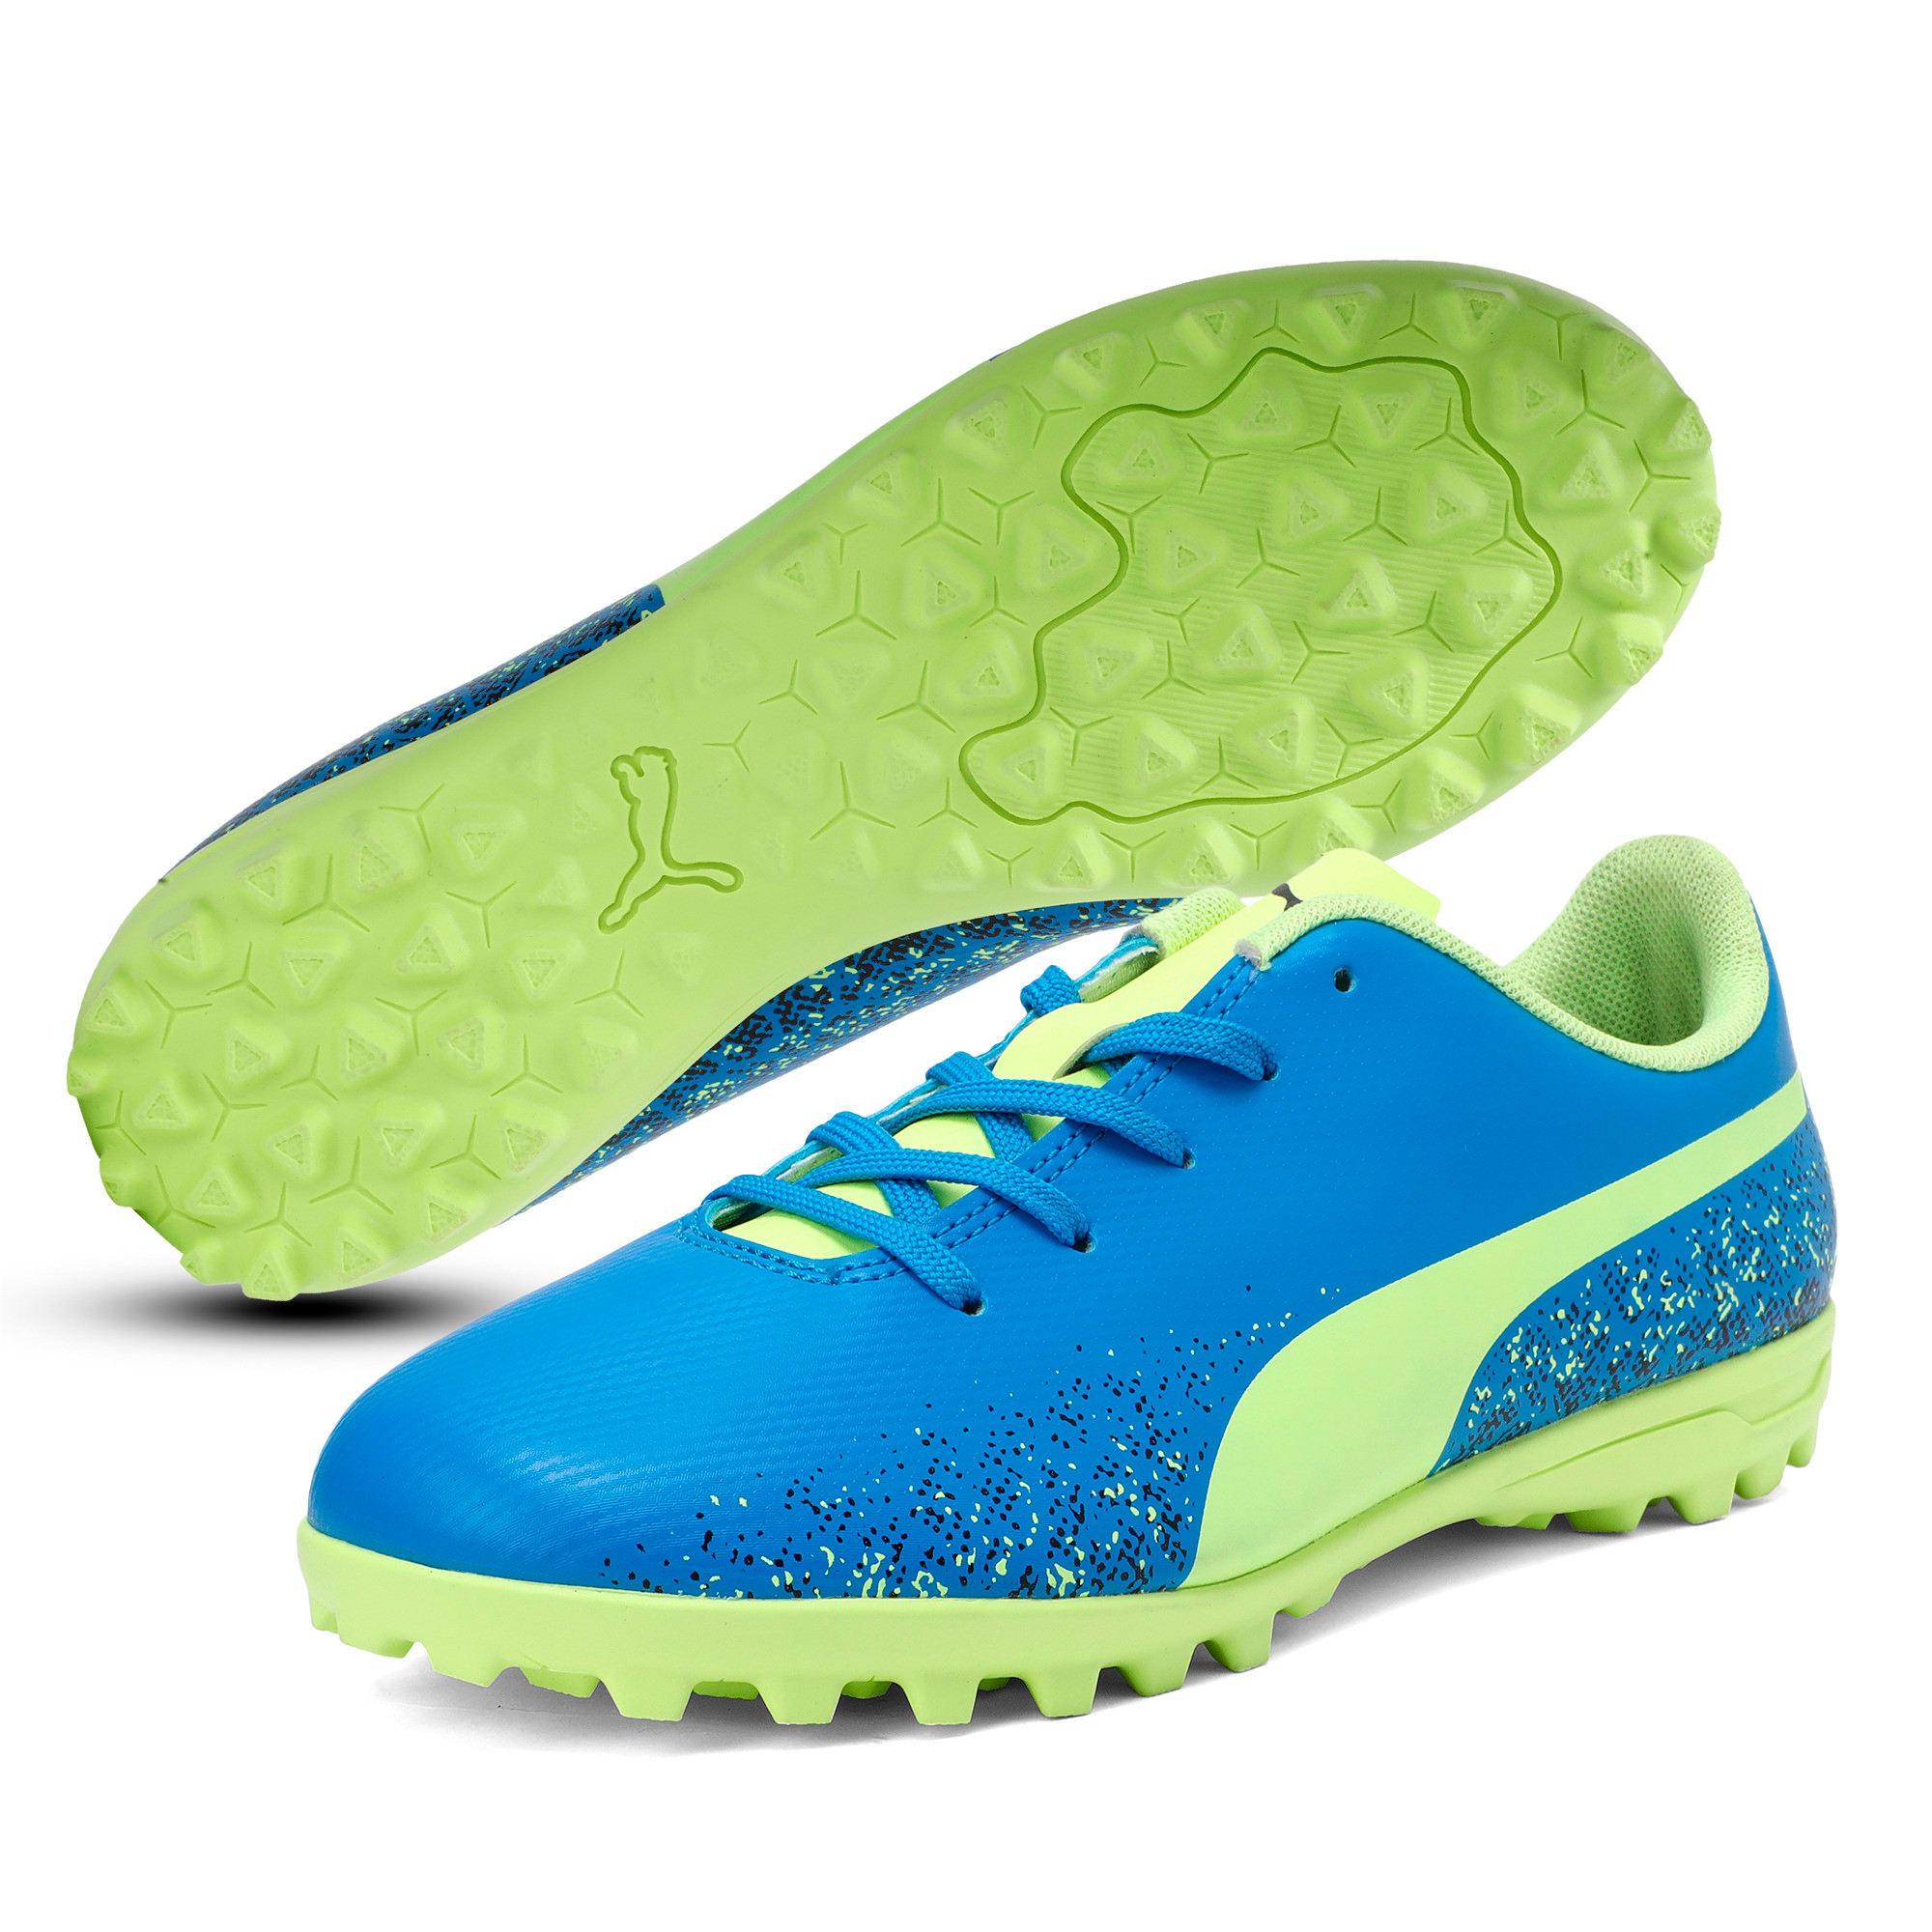 Thumbnail 2 of Truora TT Kids' Football Boots, Blue-Yellow-Black, medium-IND